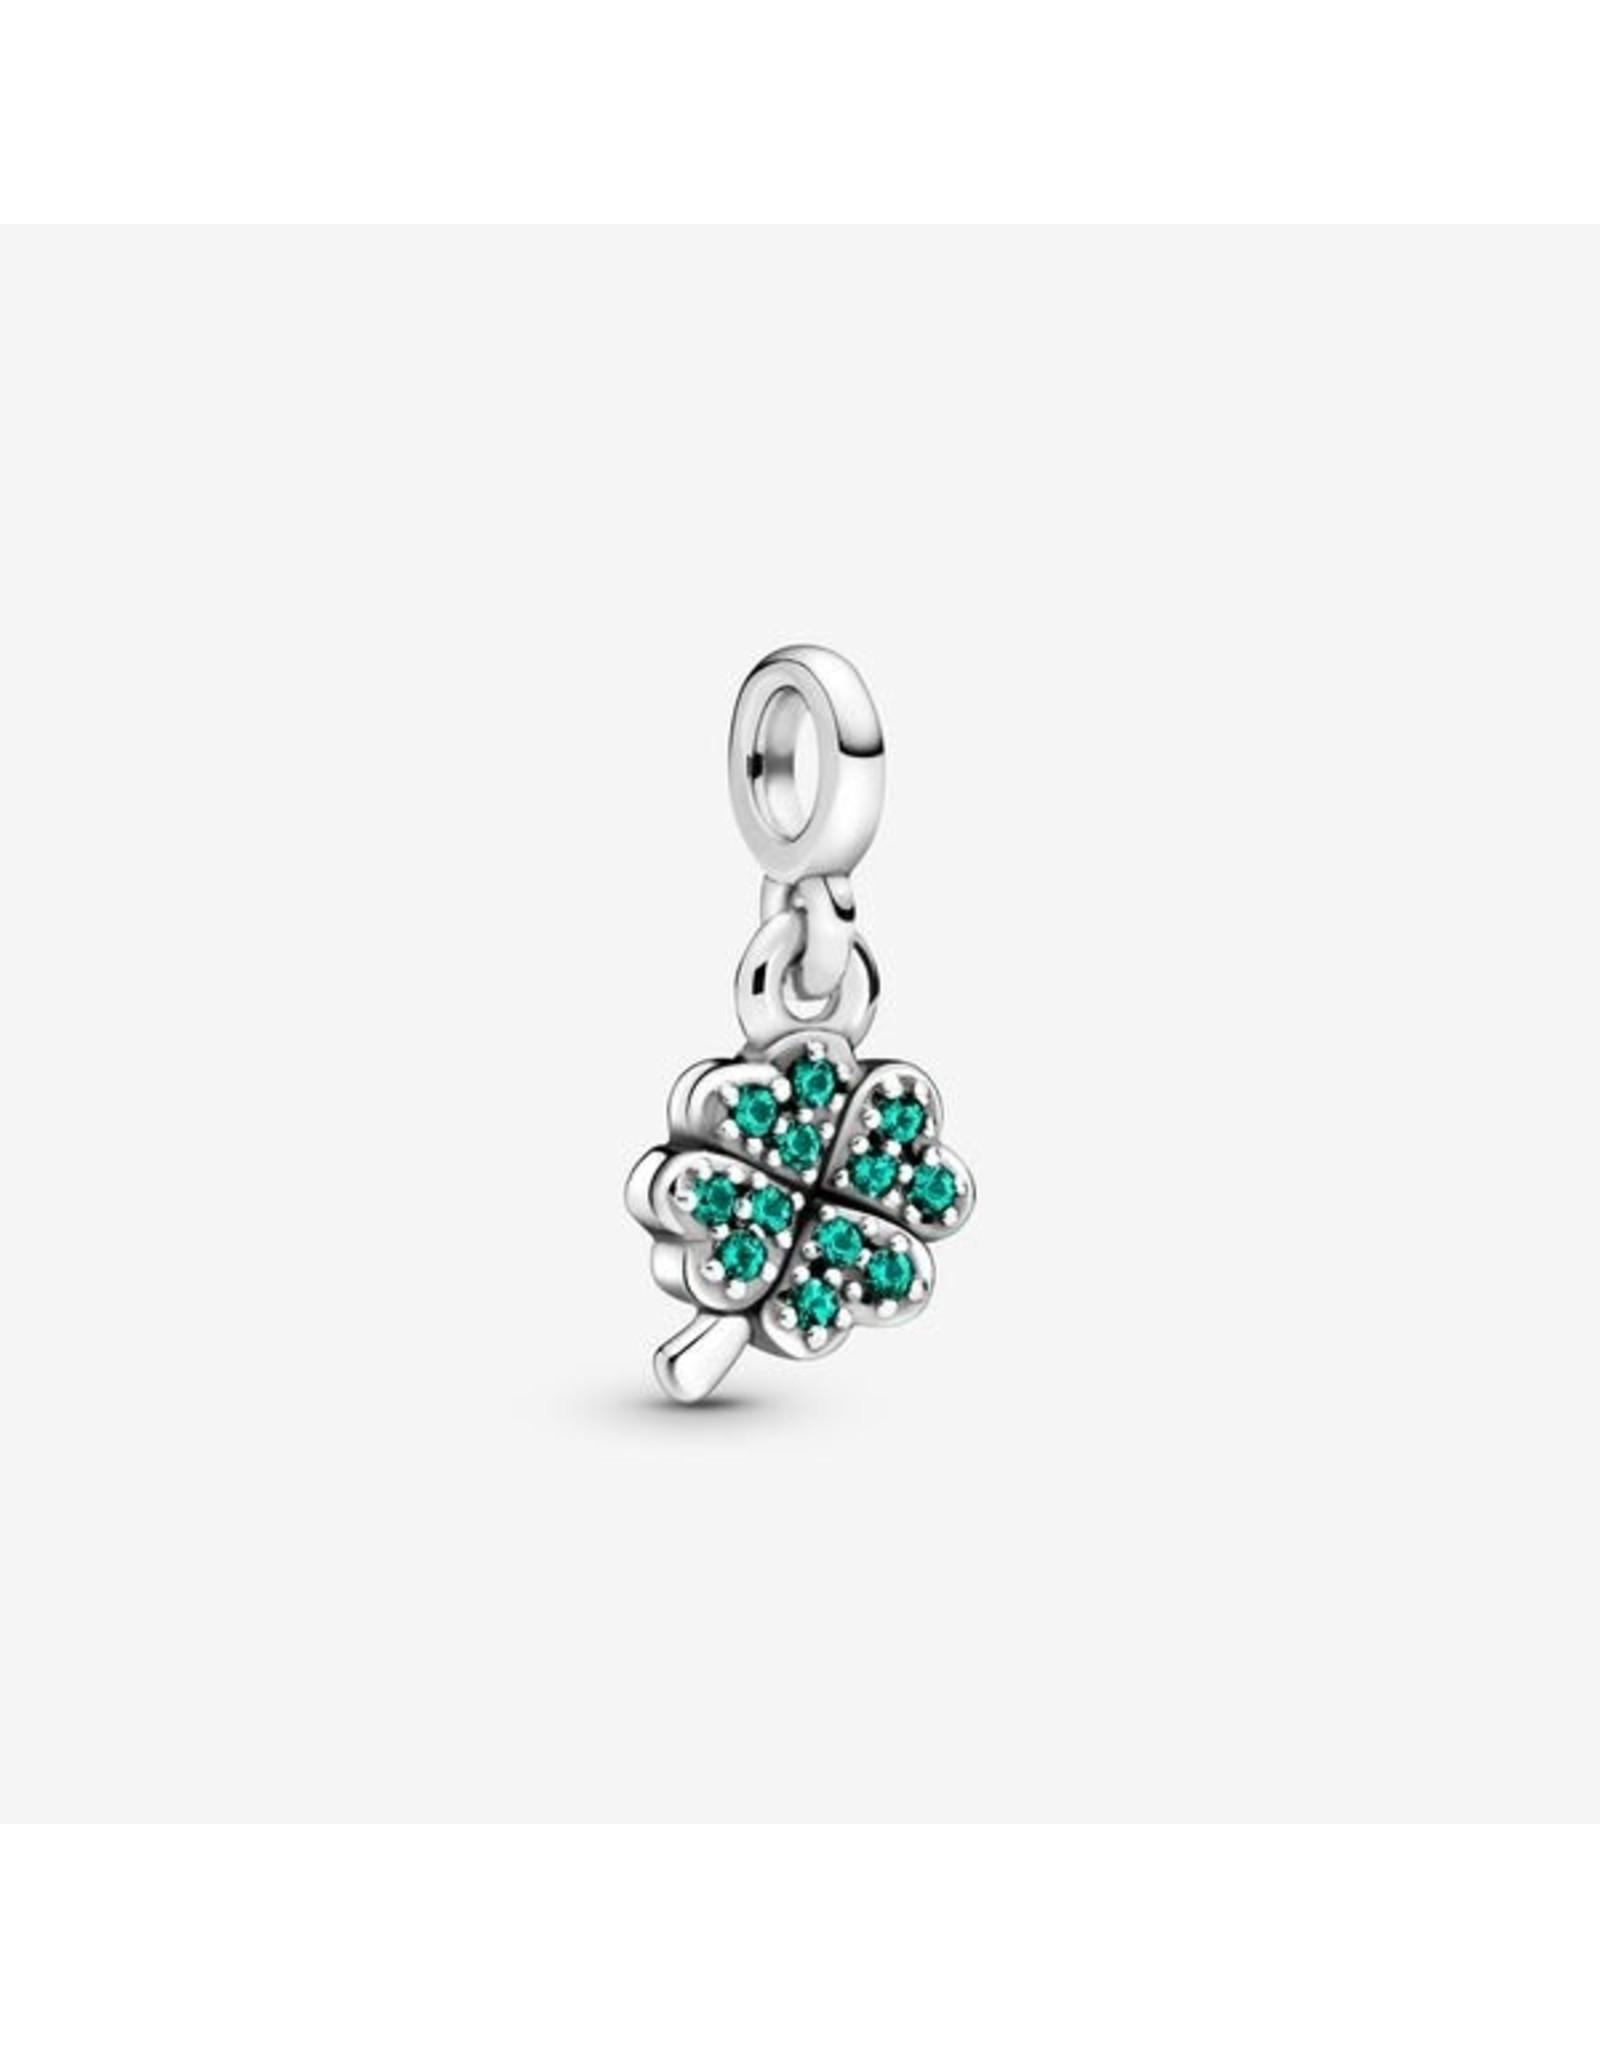 Pandora Pandora ME Charm, 798974C01, My Four-Leaf CLover Dangle, Green Crystals